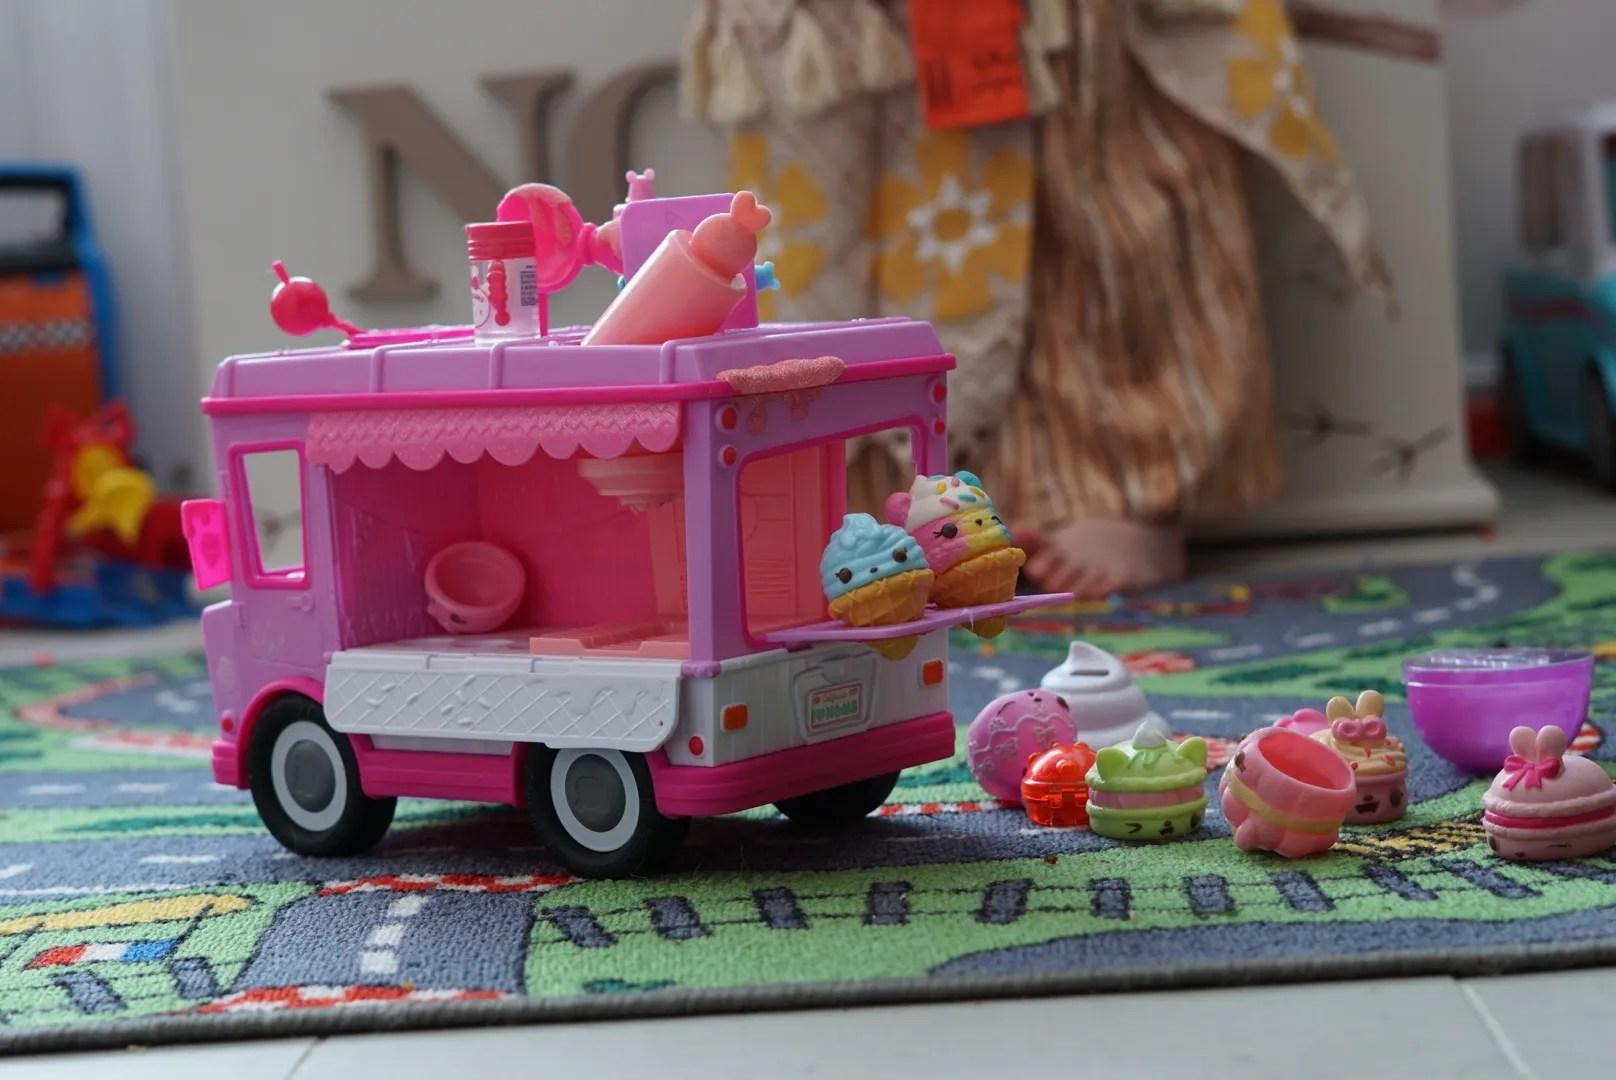 The Num Noms glitter lipgloss truck